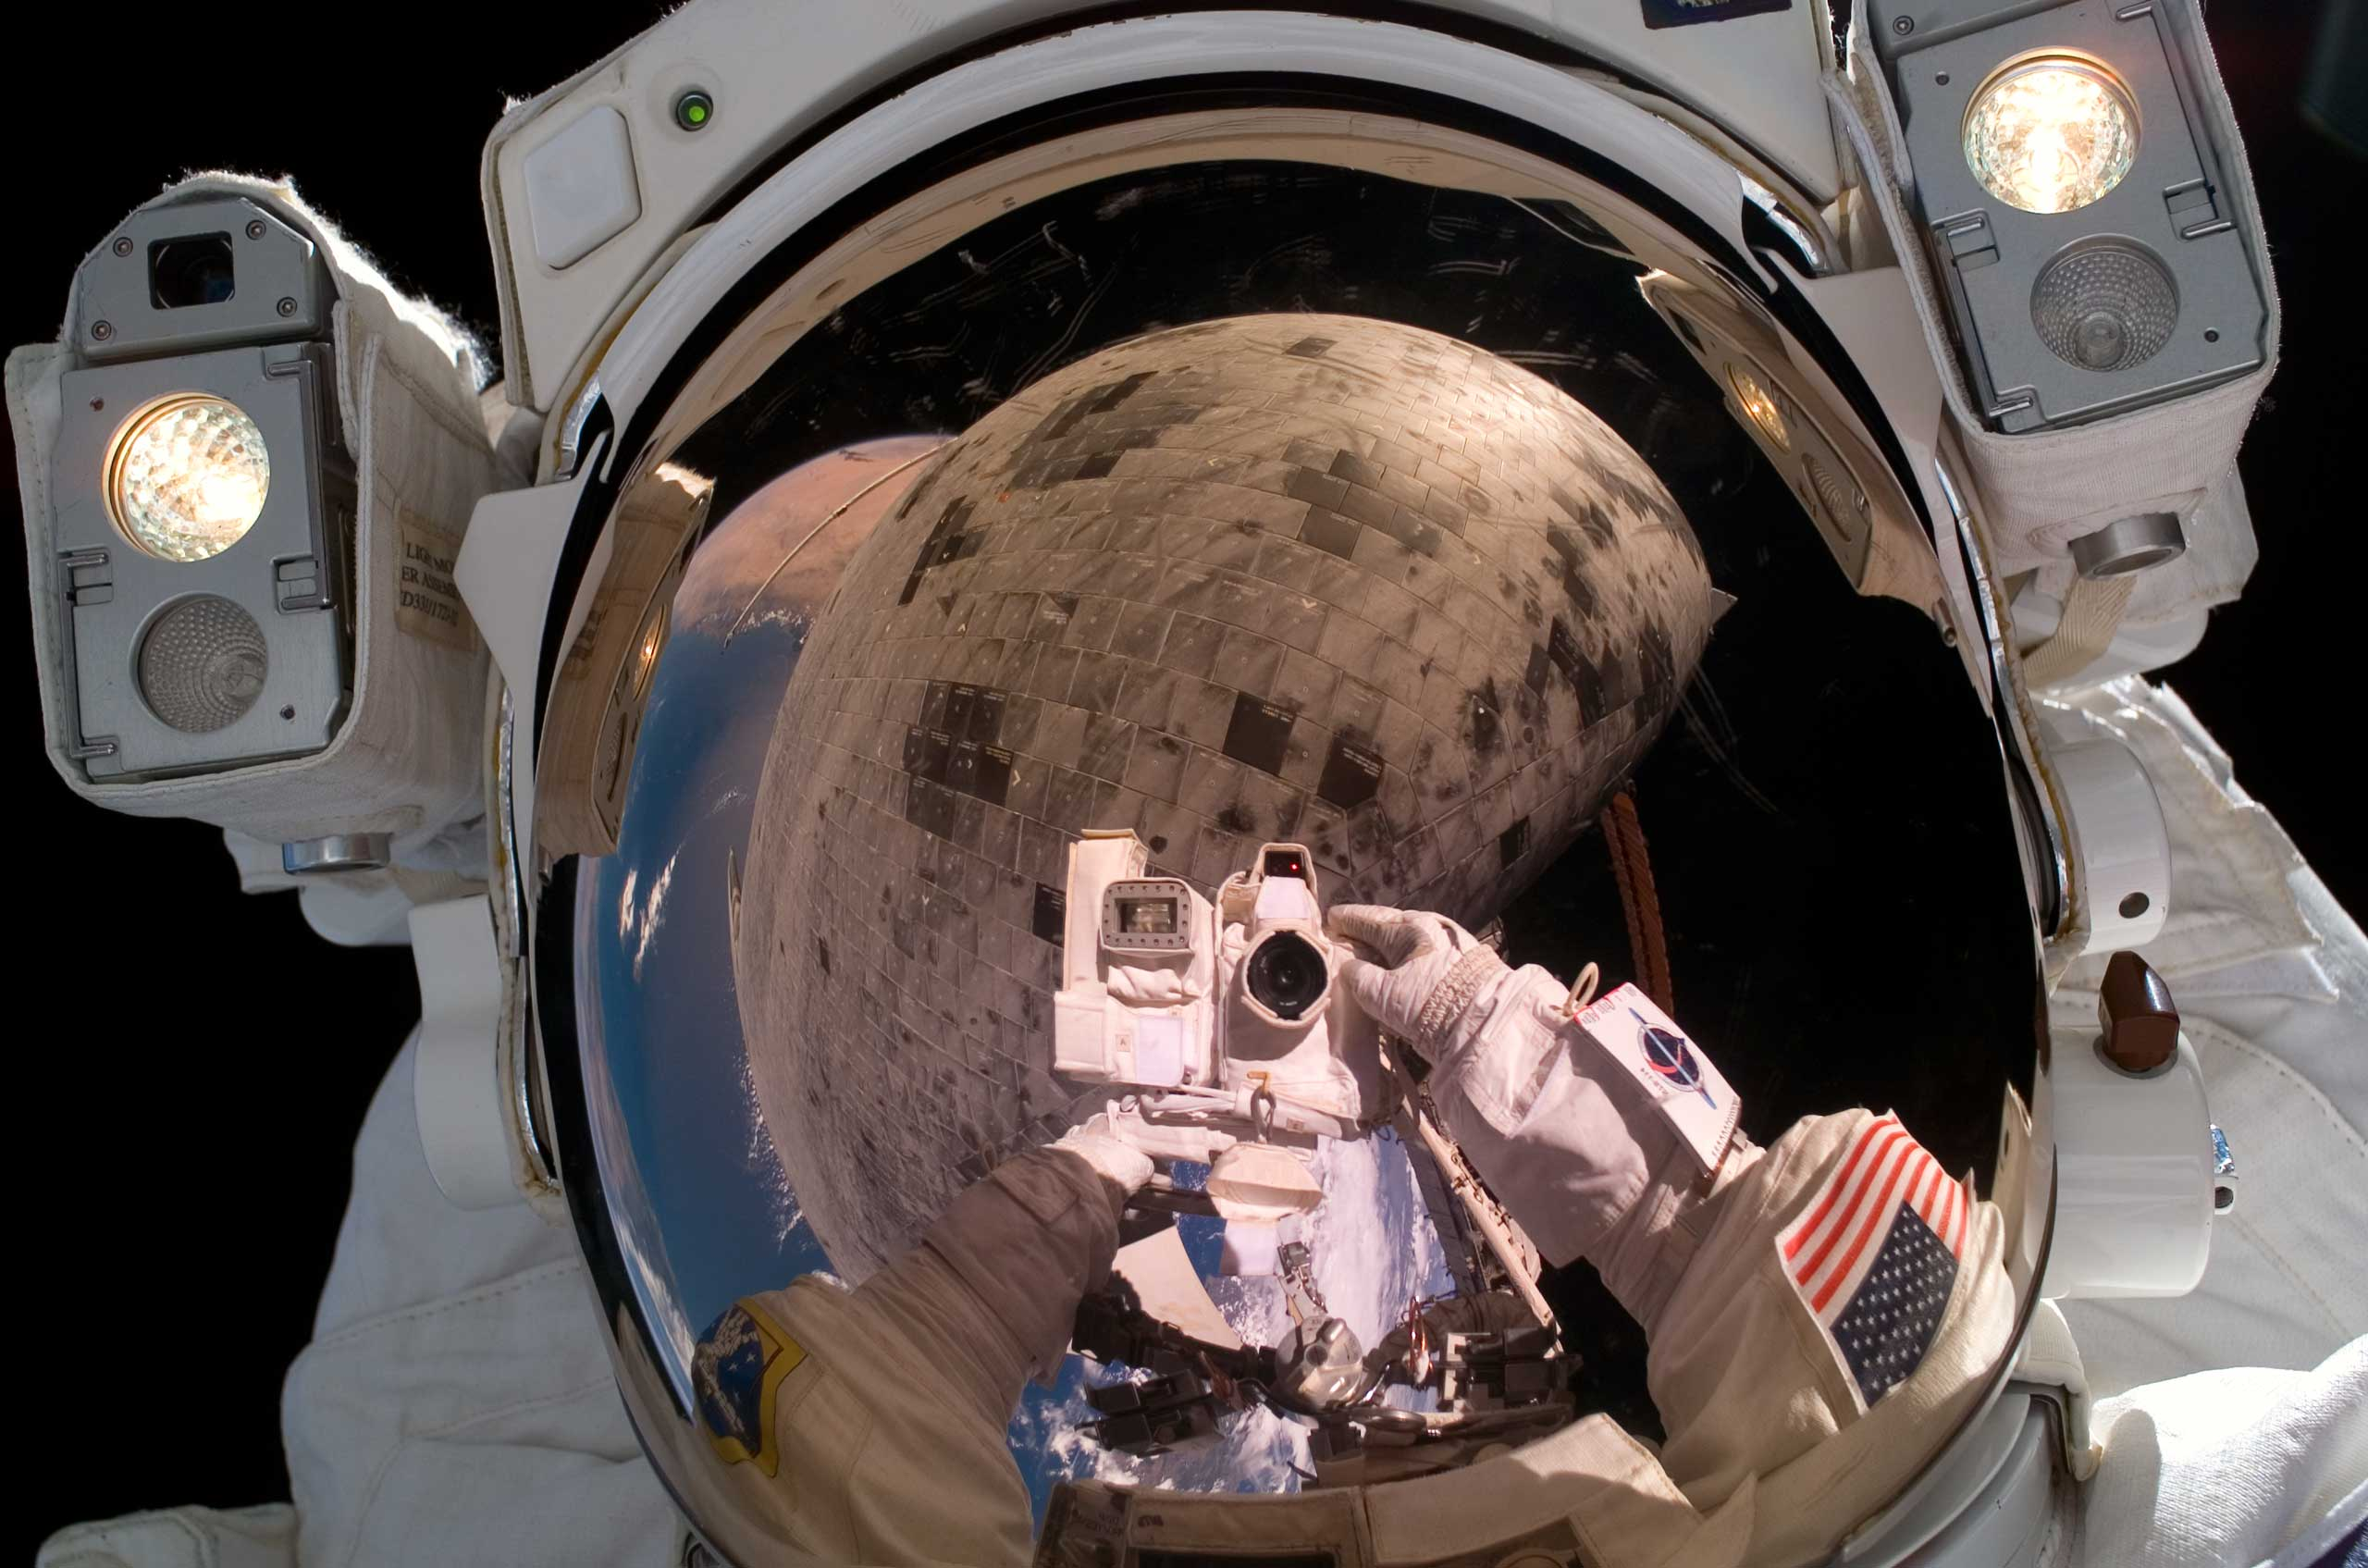 Astronaut Stephen K. Robinson takes a selfie during a spacewalk on Aug. 3, 2005.